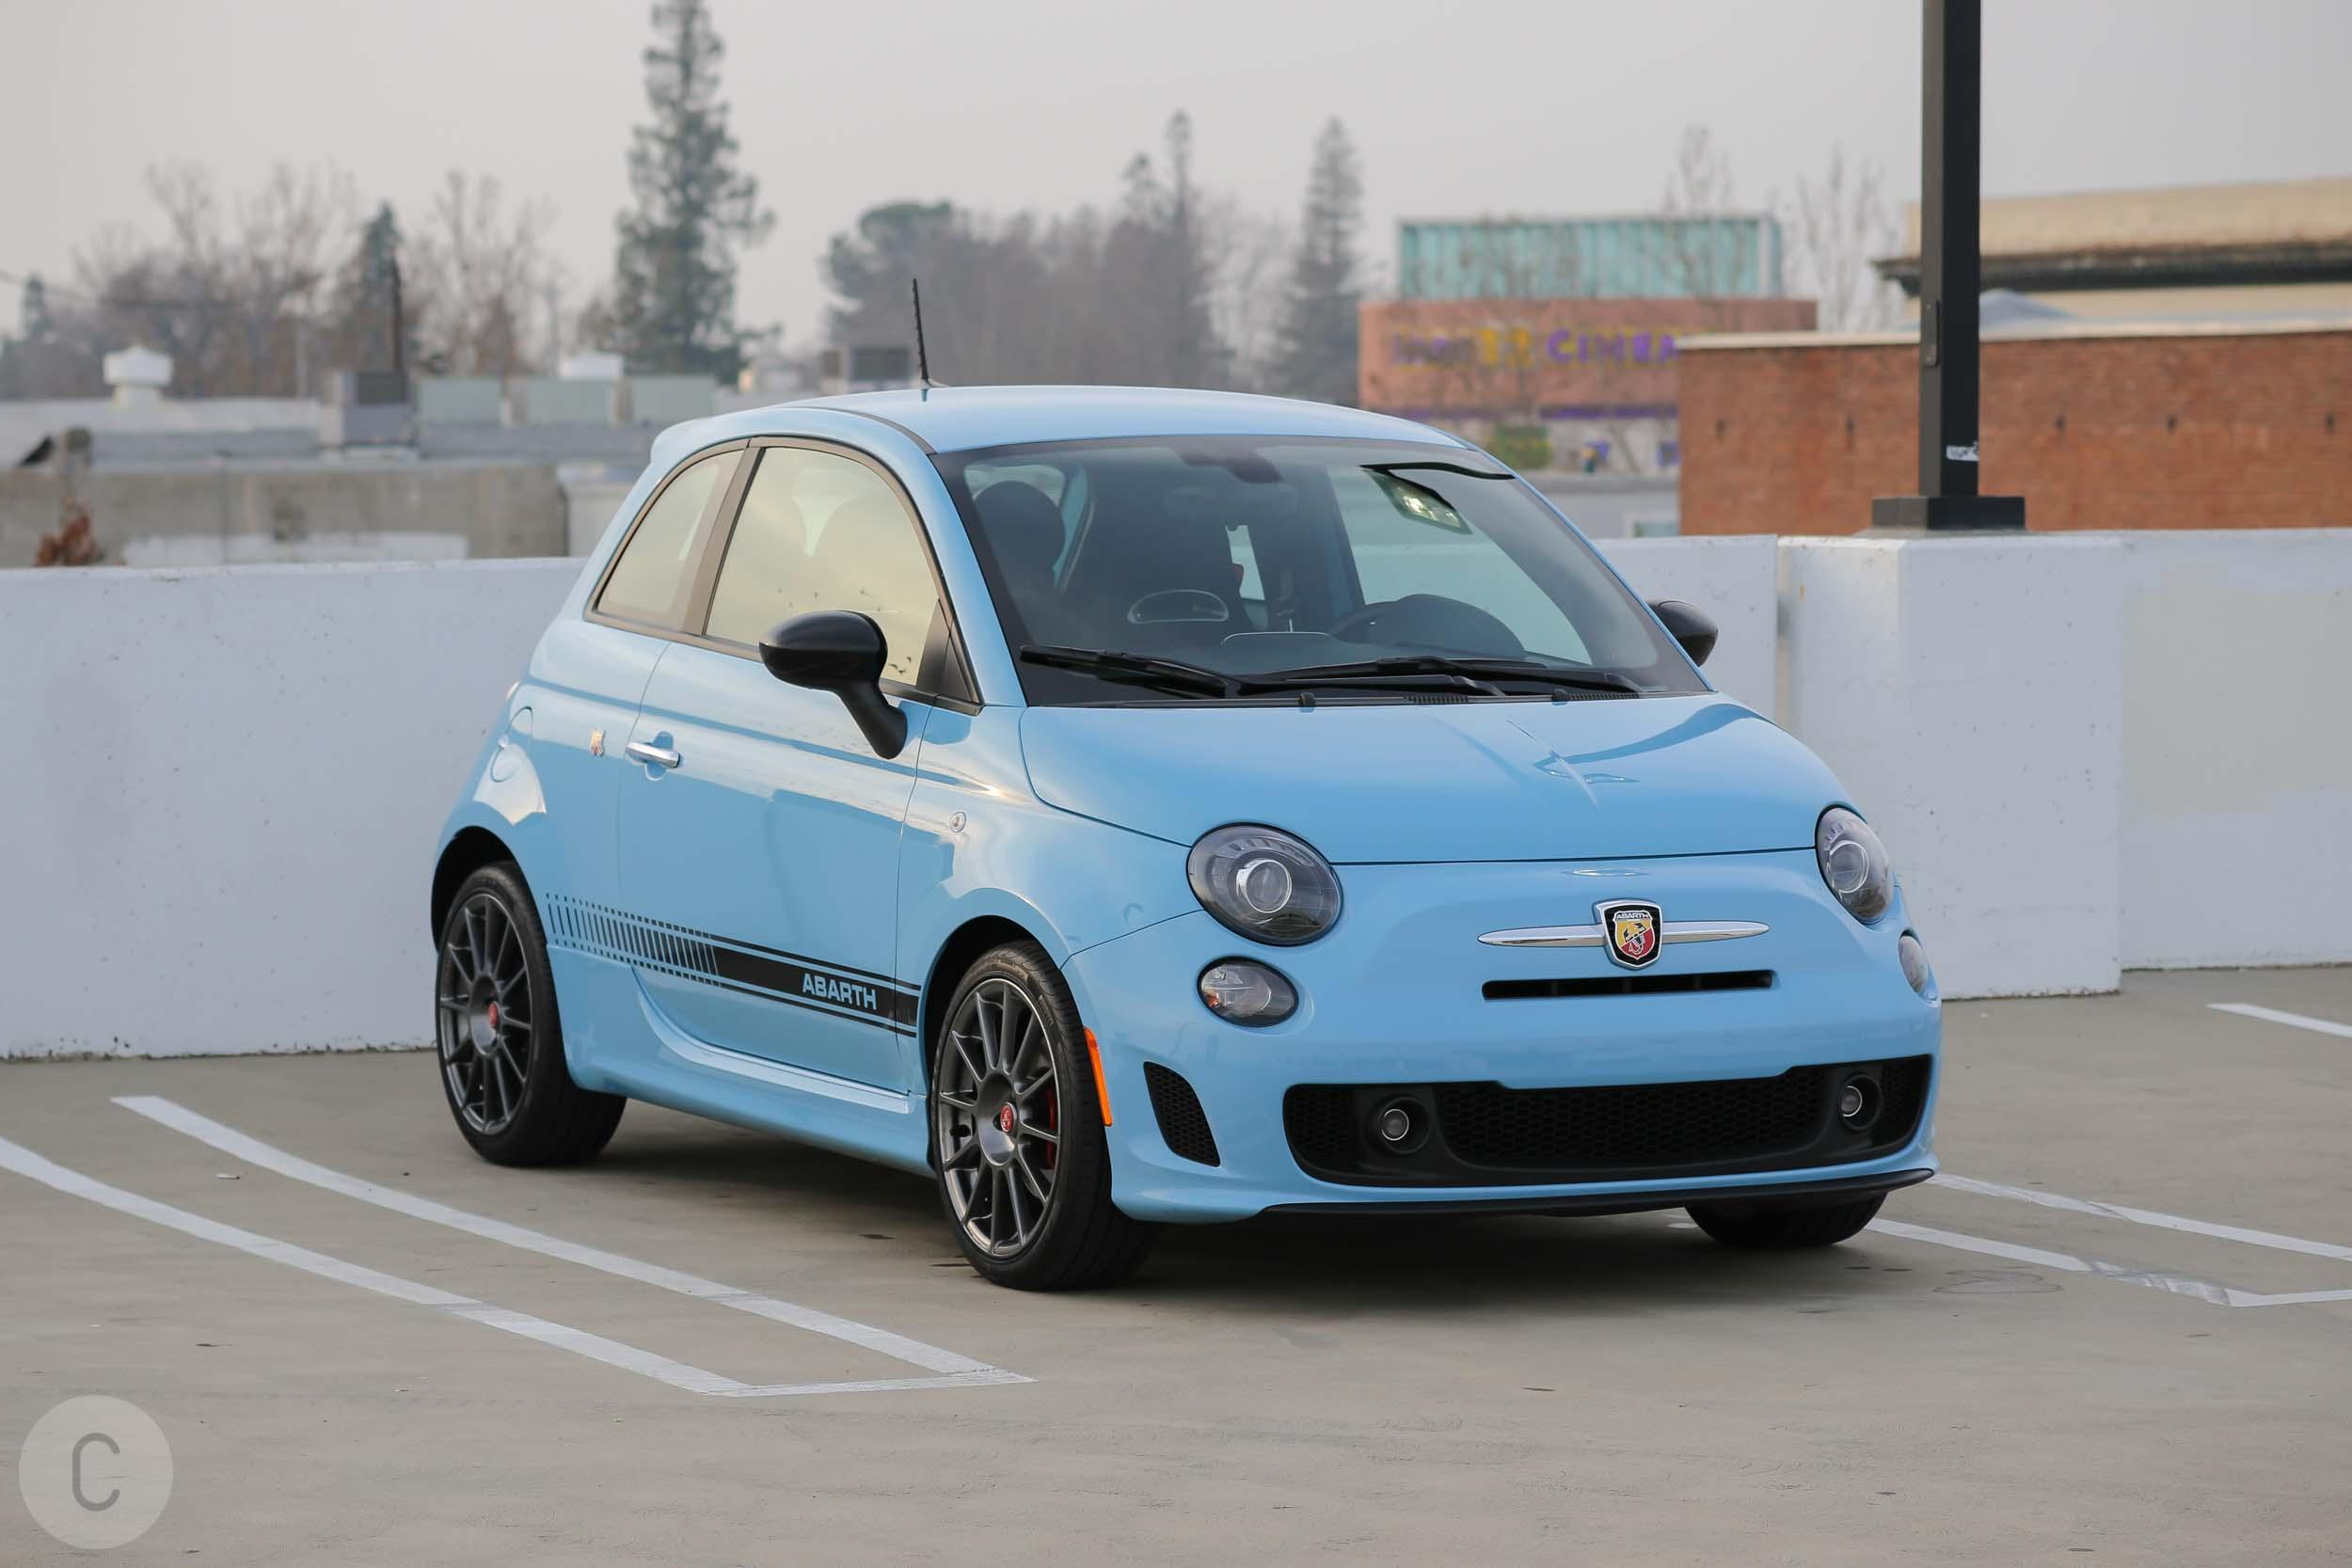 fiat a news largo car hamann dynamism full of auto sports